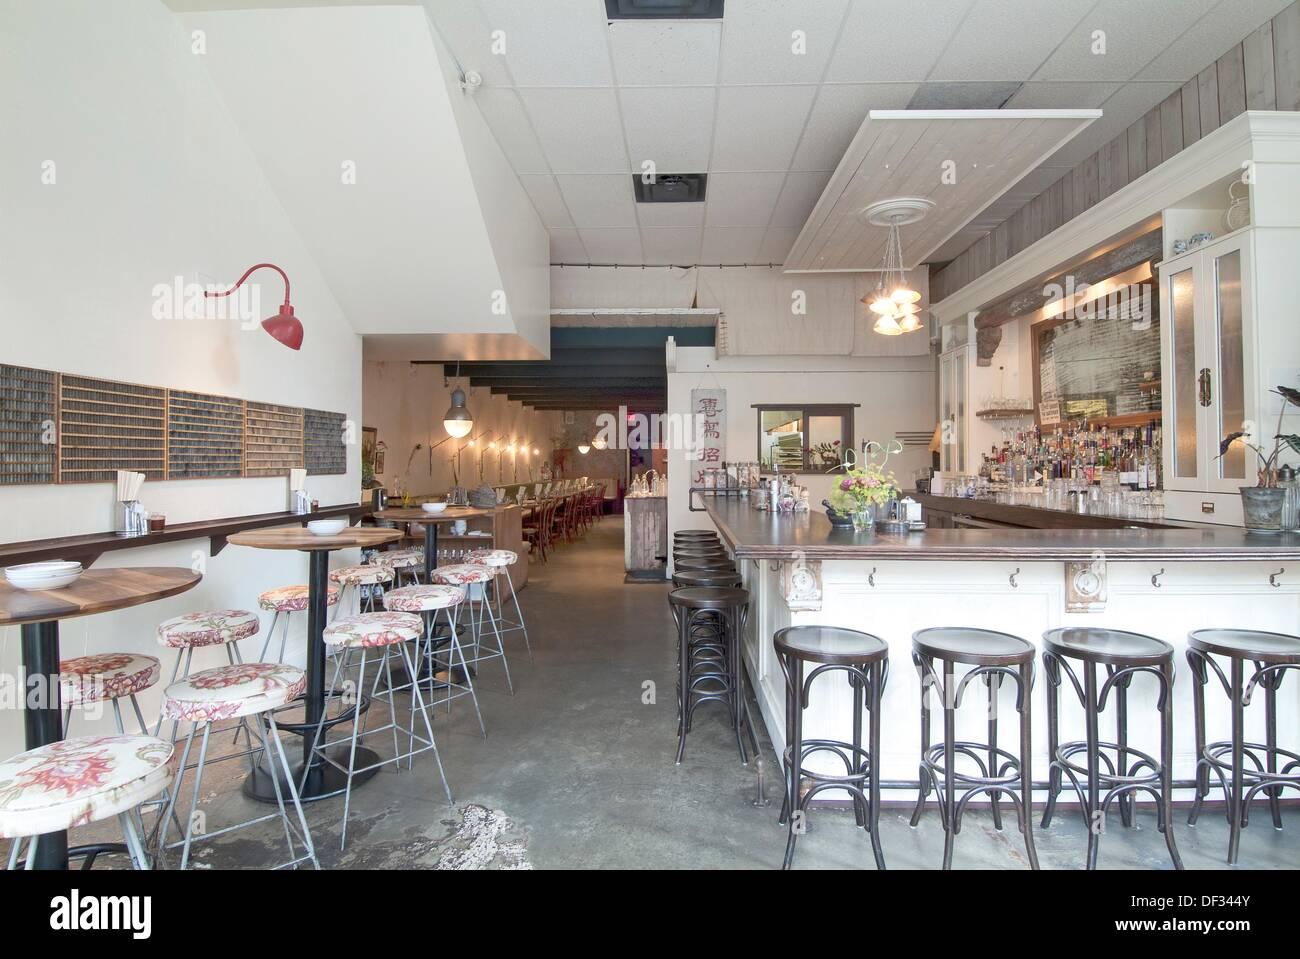 Restaurant Design Vancouver Bc : Bao bei restaurant interior vancouver bc canada stock